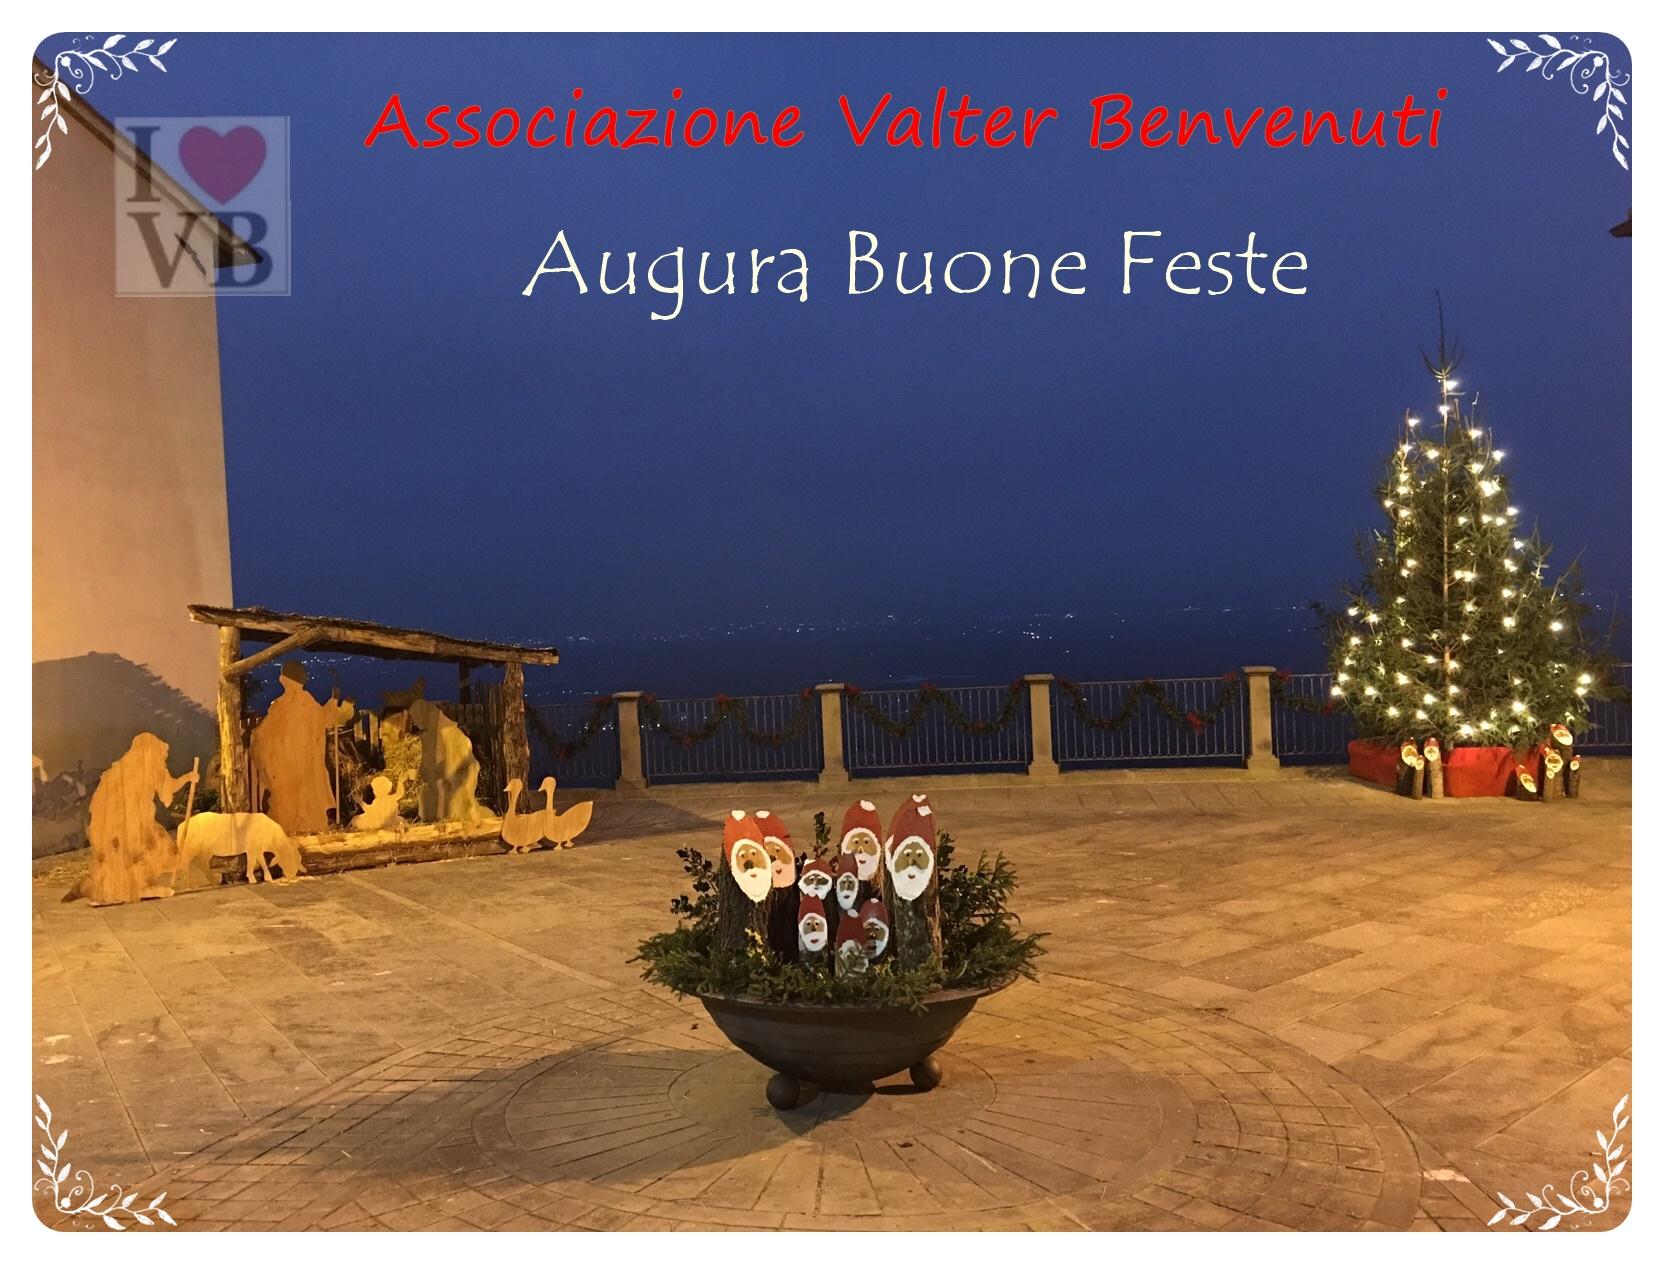 Natale2015AVB - Buone Feste